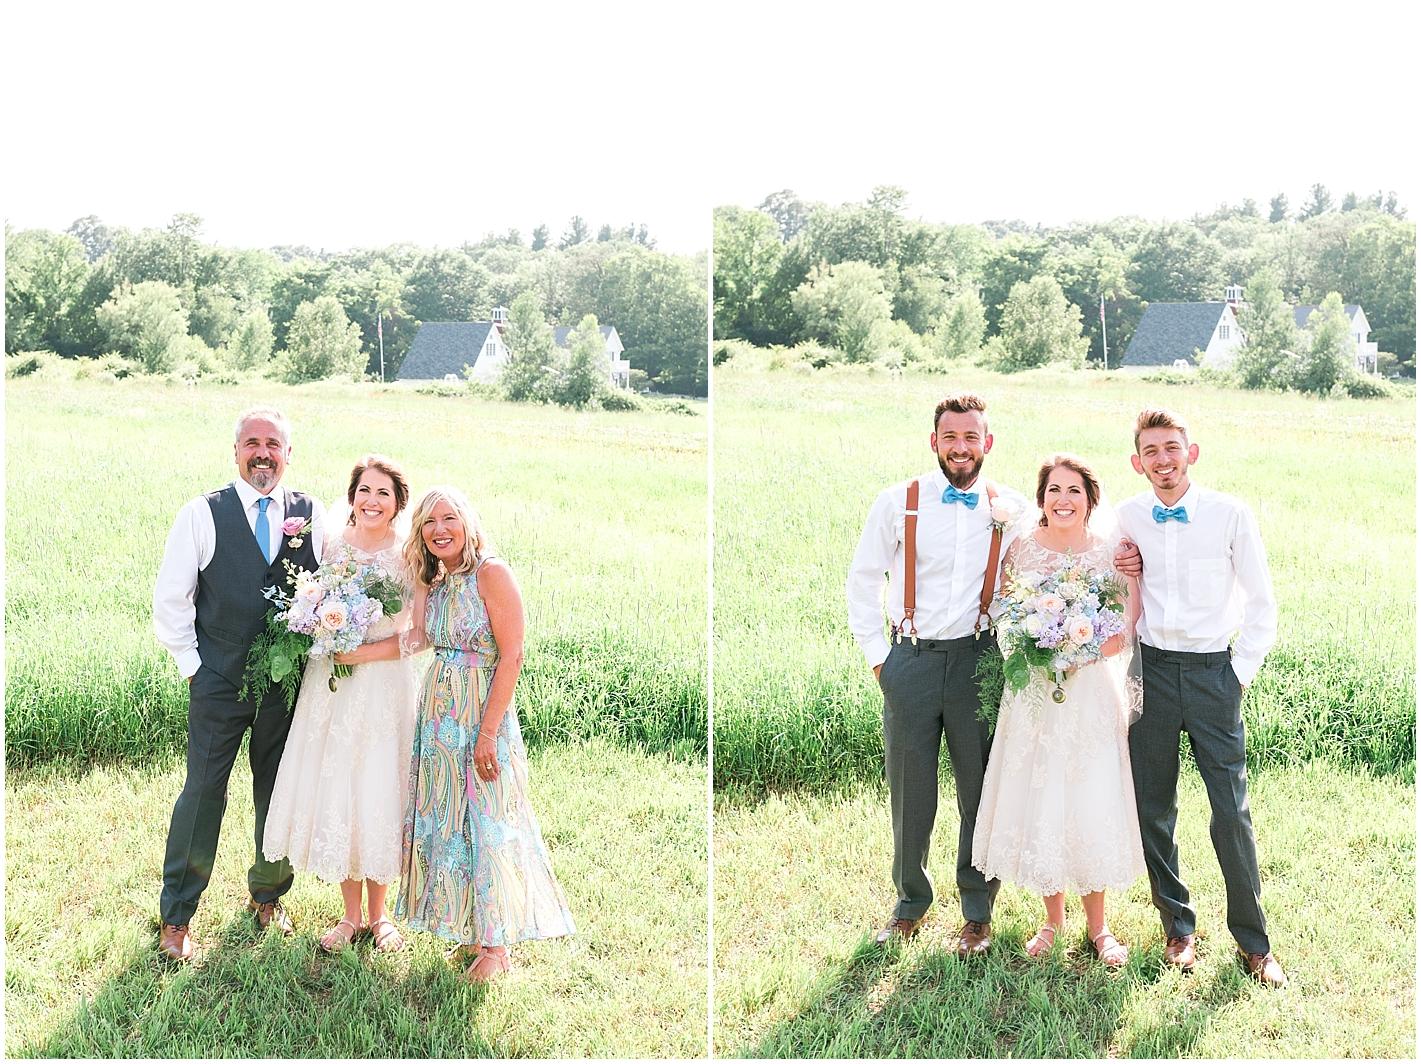 Family Photos by Alyssa Parker Photography